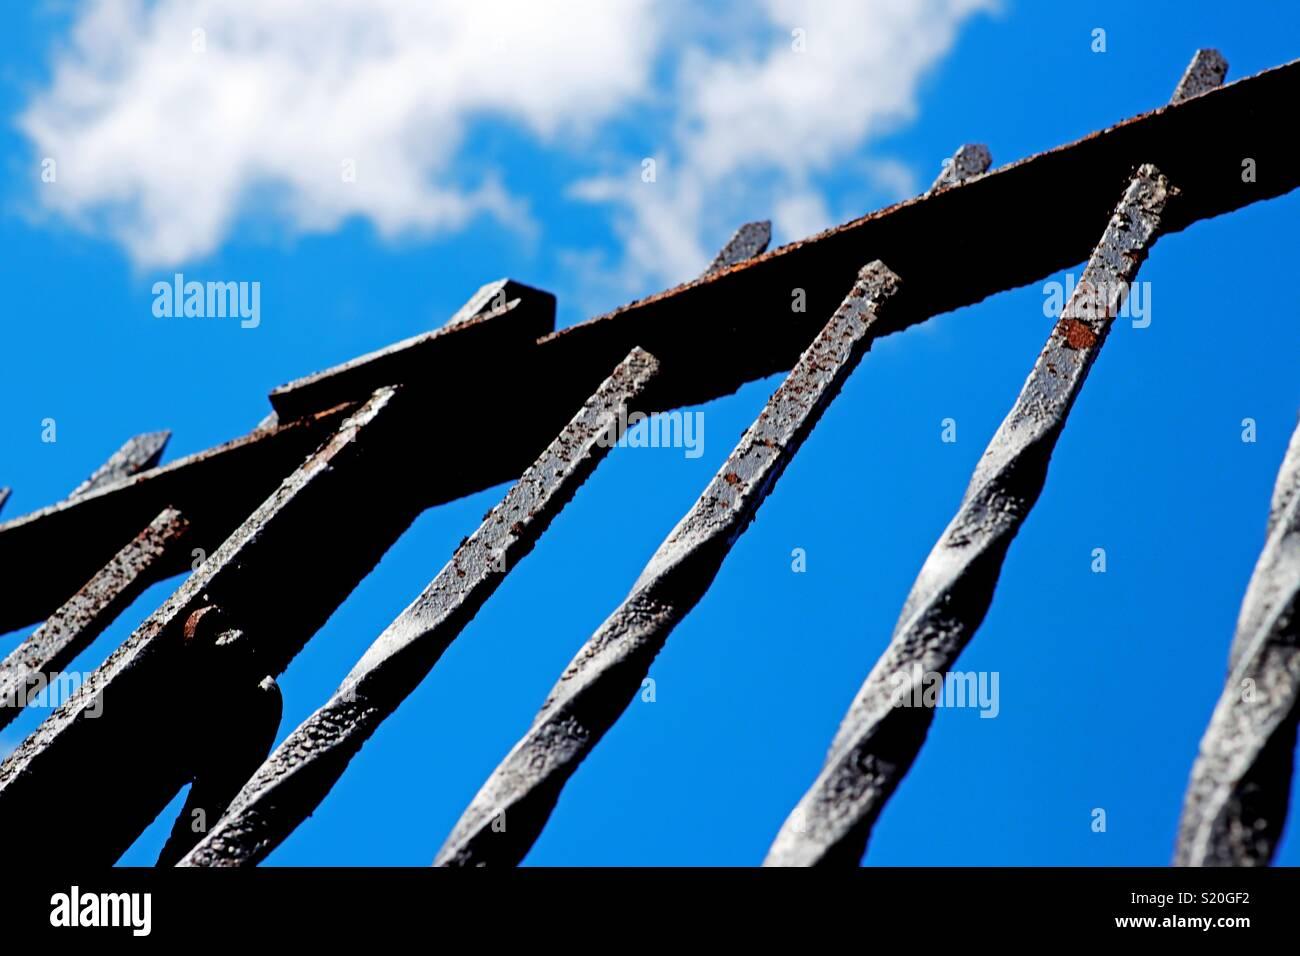 Rusty Sky Stockfotos & Rusty Sky Bilder - Alamy